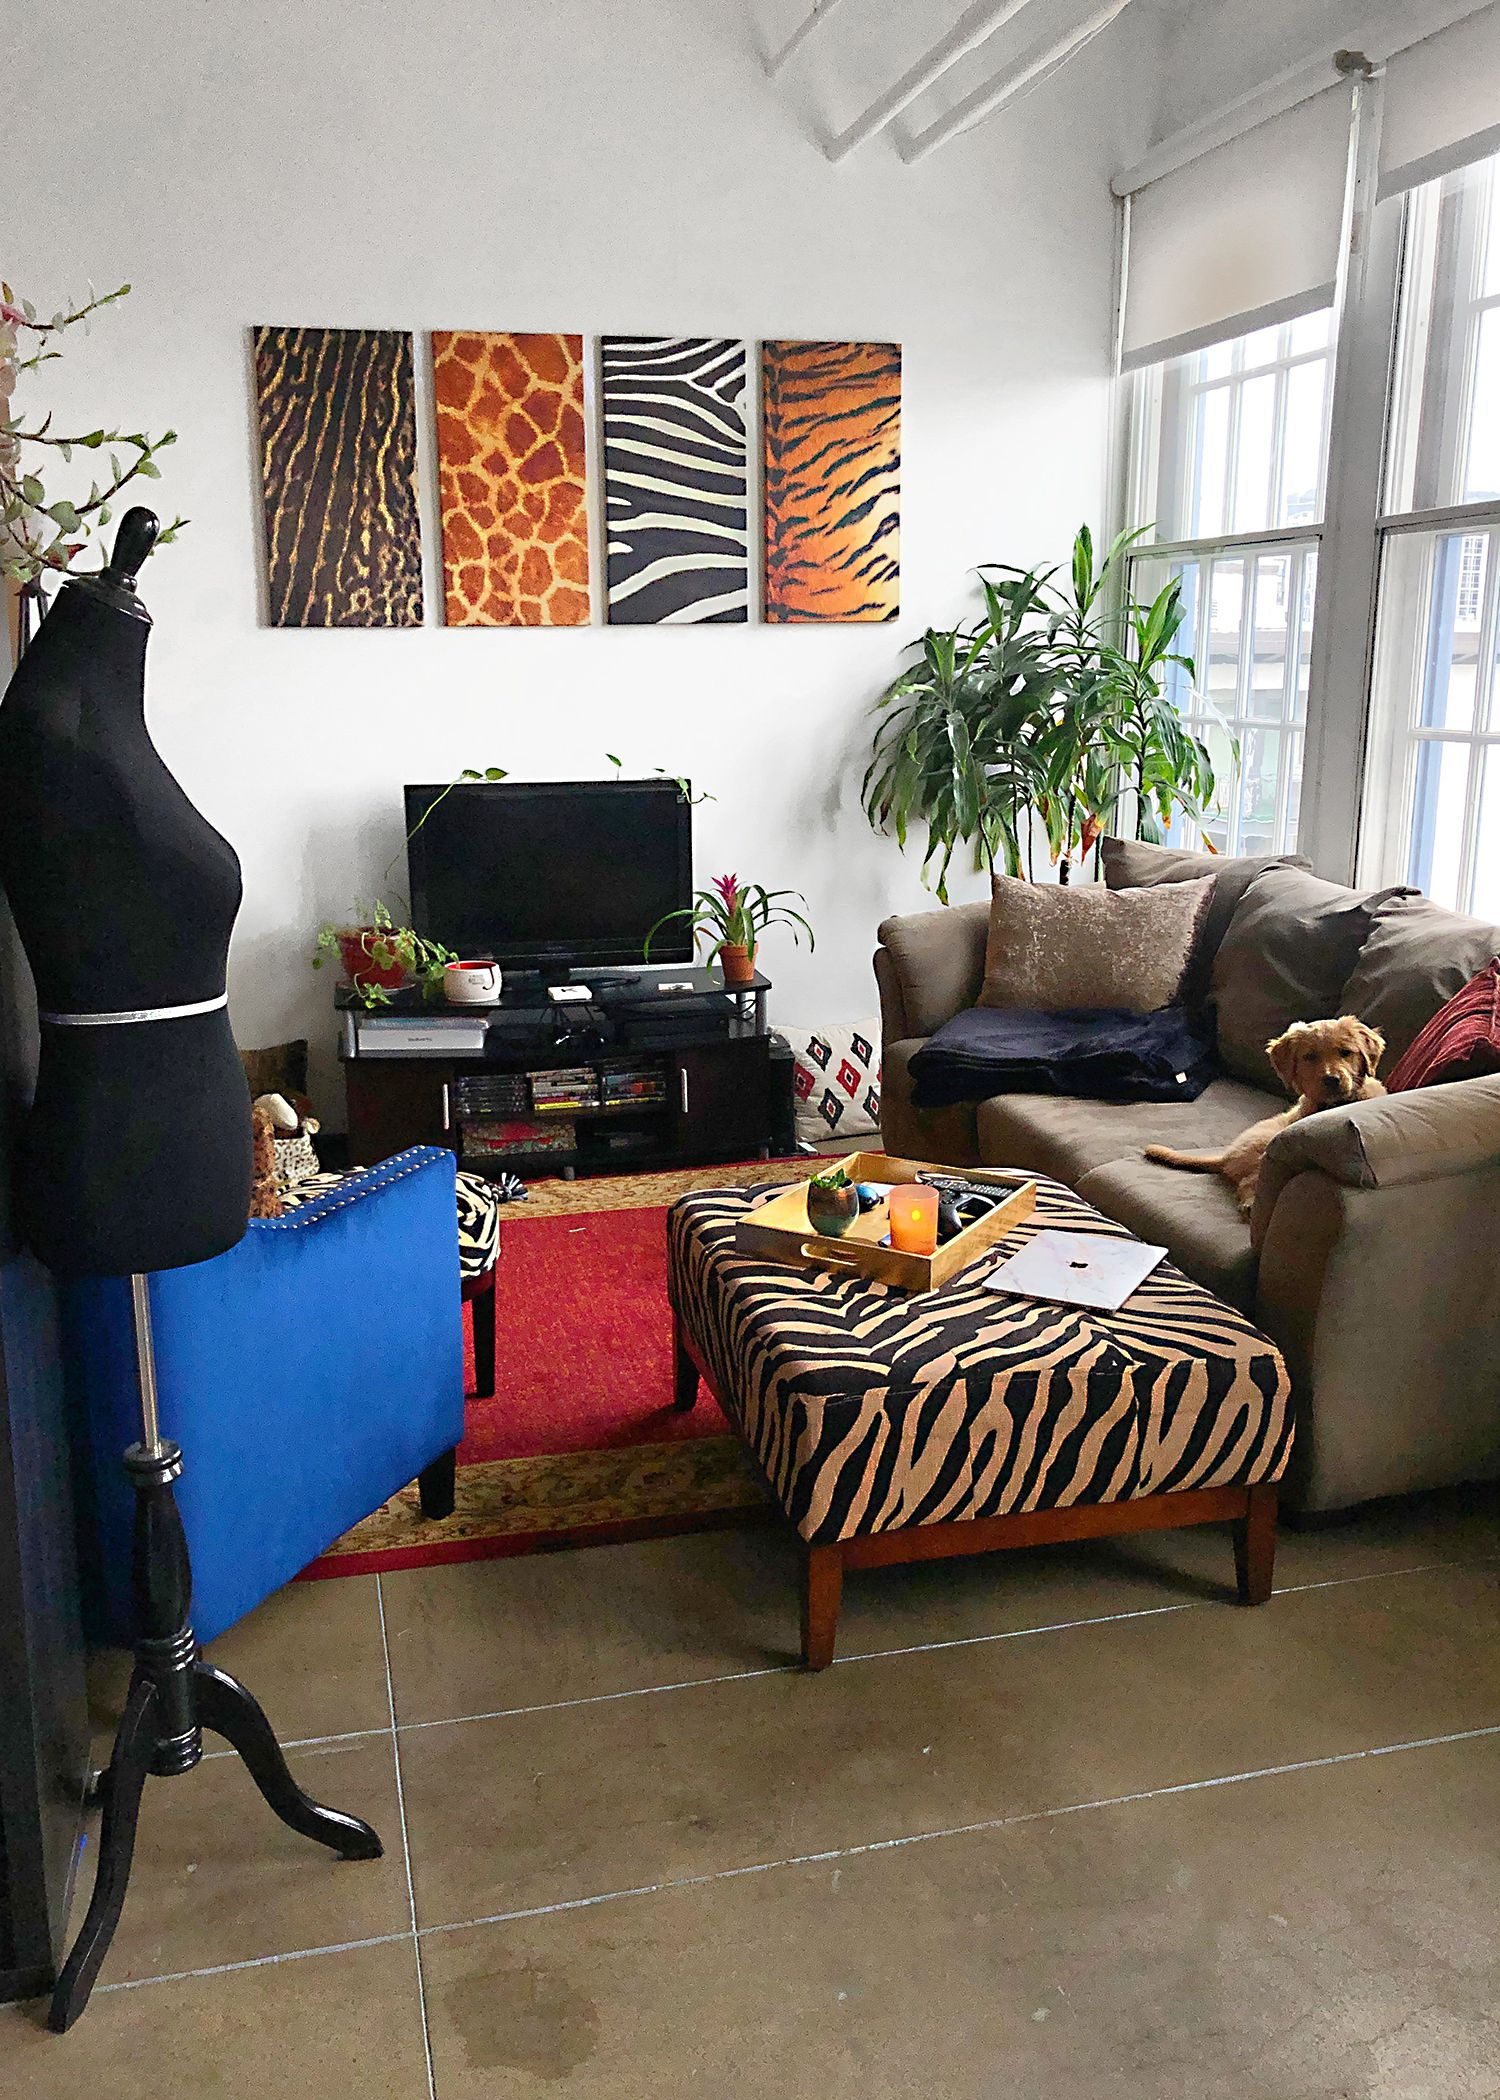 My Apartment Decor Tour Katey Blaire In 2020 Apartment Decor Inspiration Apartment Decor Apartment Interior Design